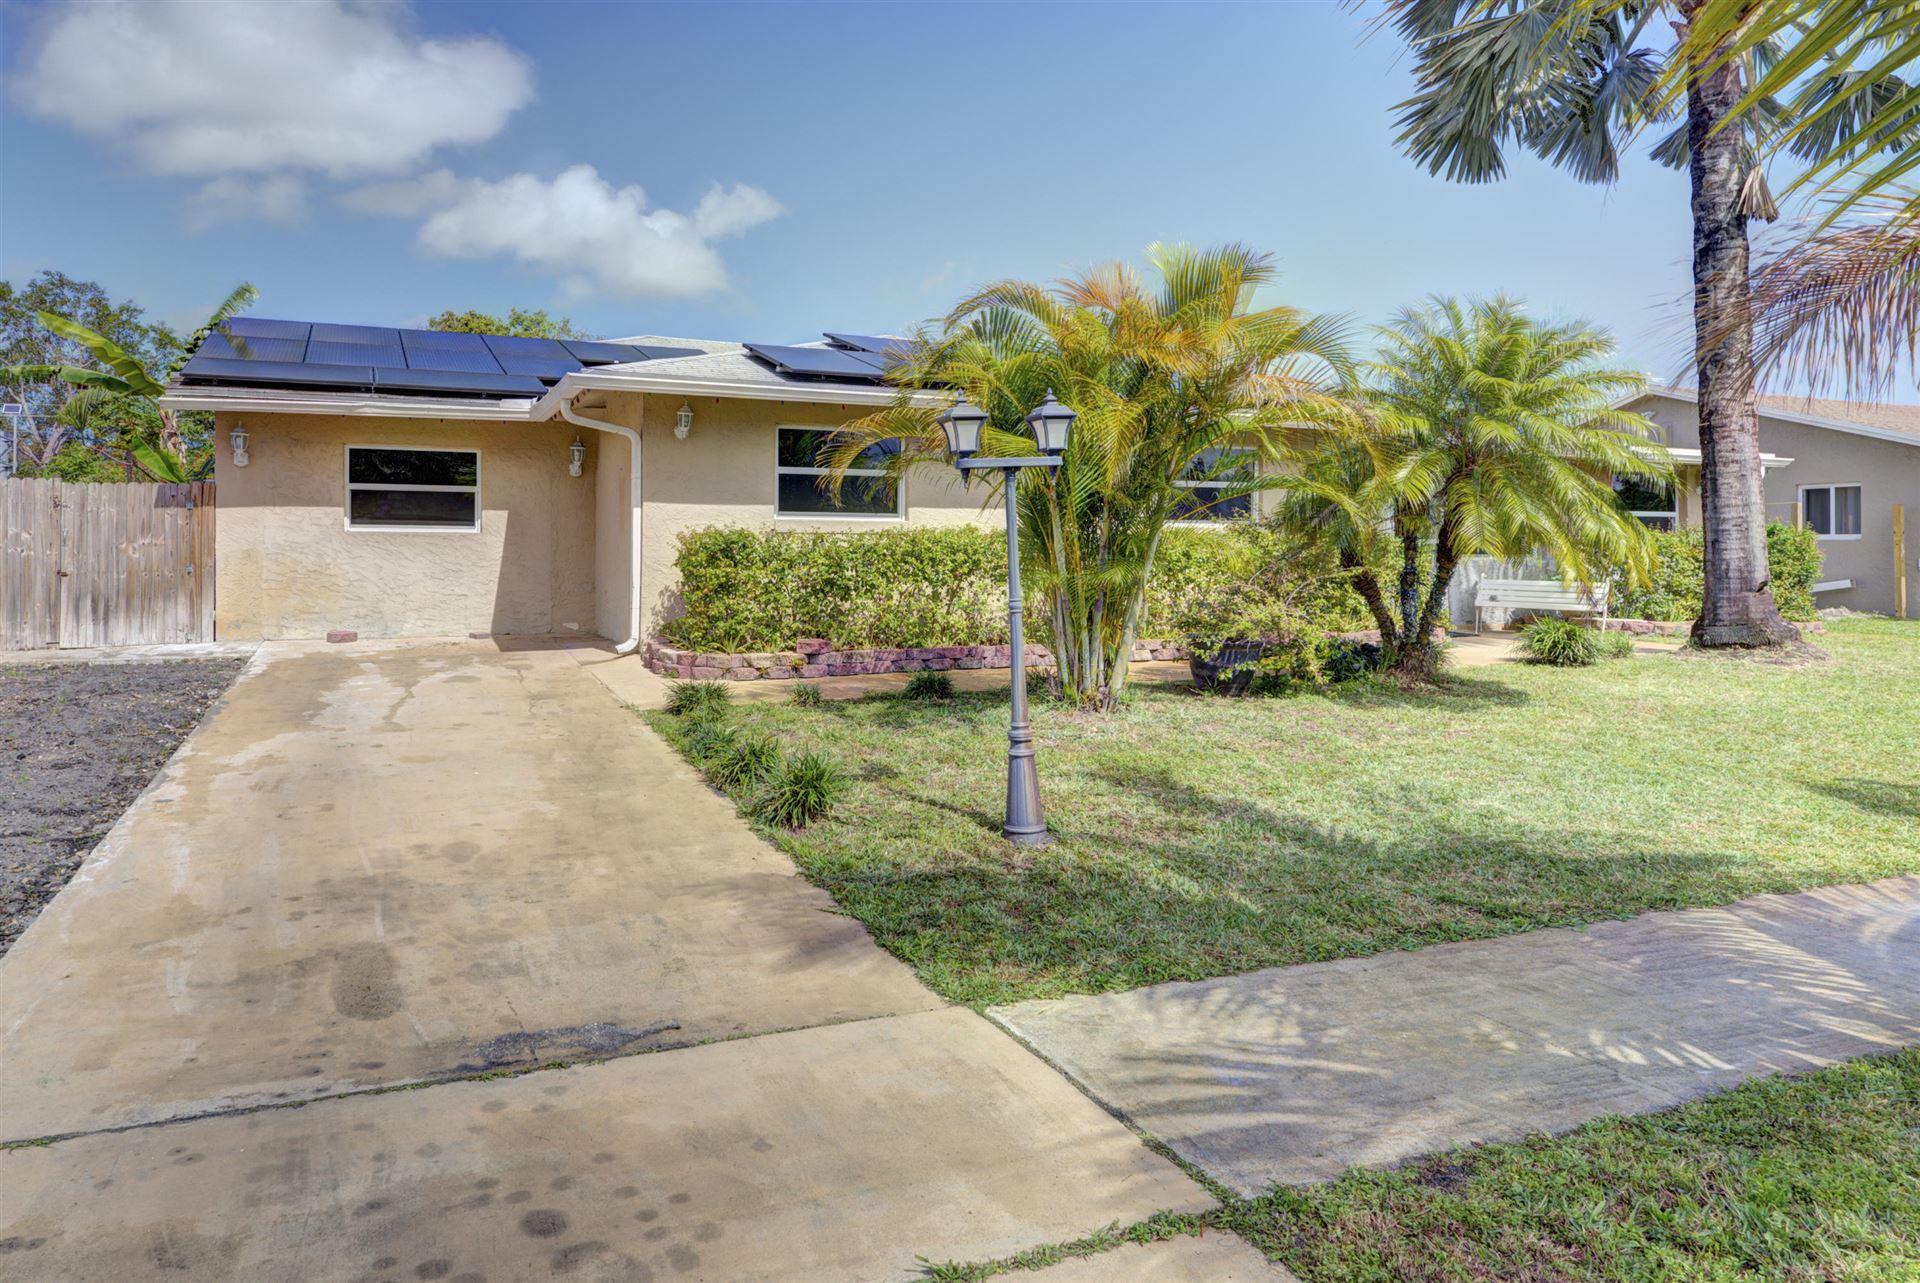 10389 Sleepy Brook Way, Boca Raton, FL 33428 - #: RX-10605164